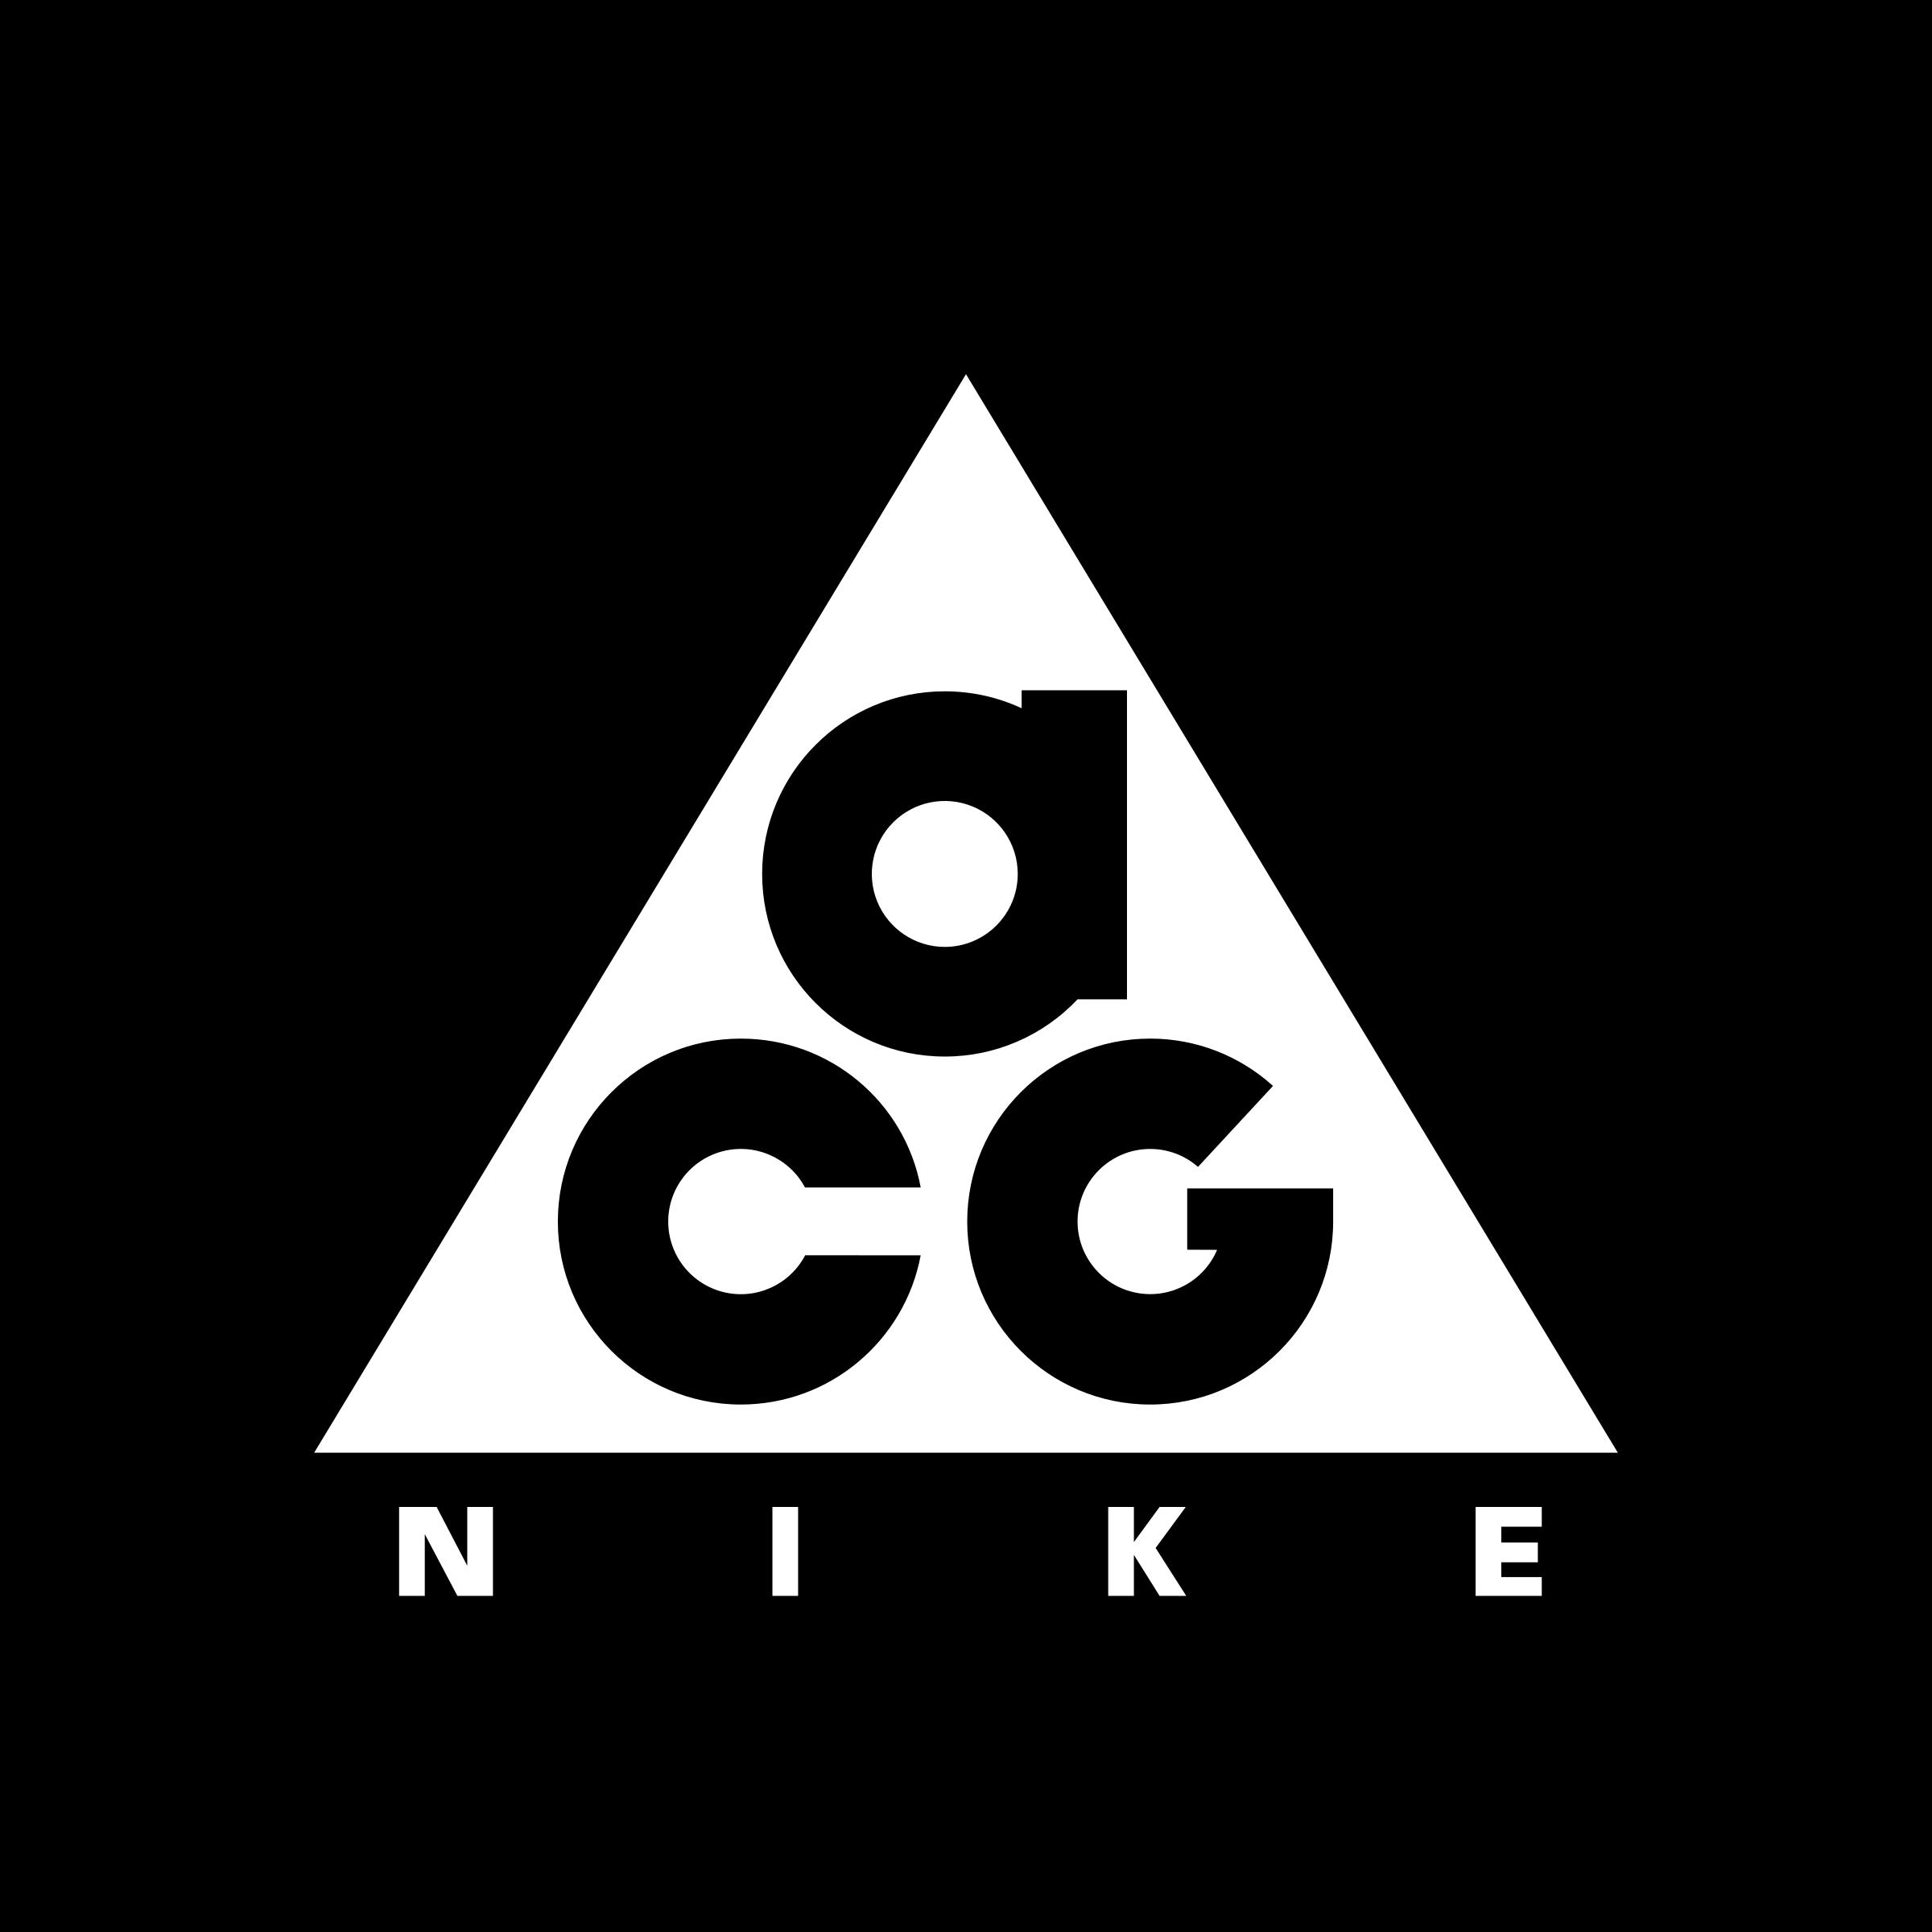 NIKE ACG LOGO Nike acg, Outdoor logos, Minimalist logo